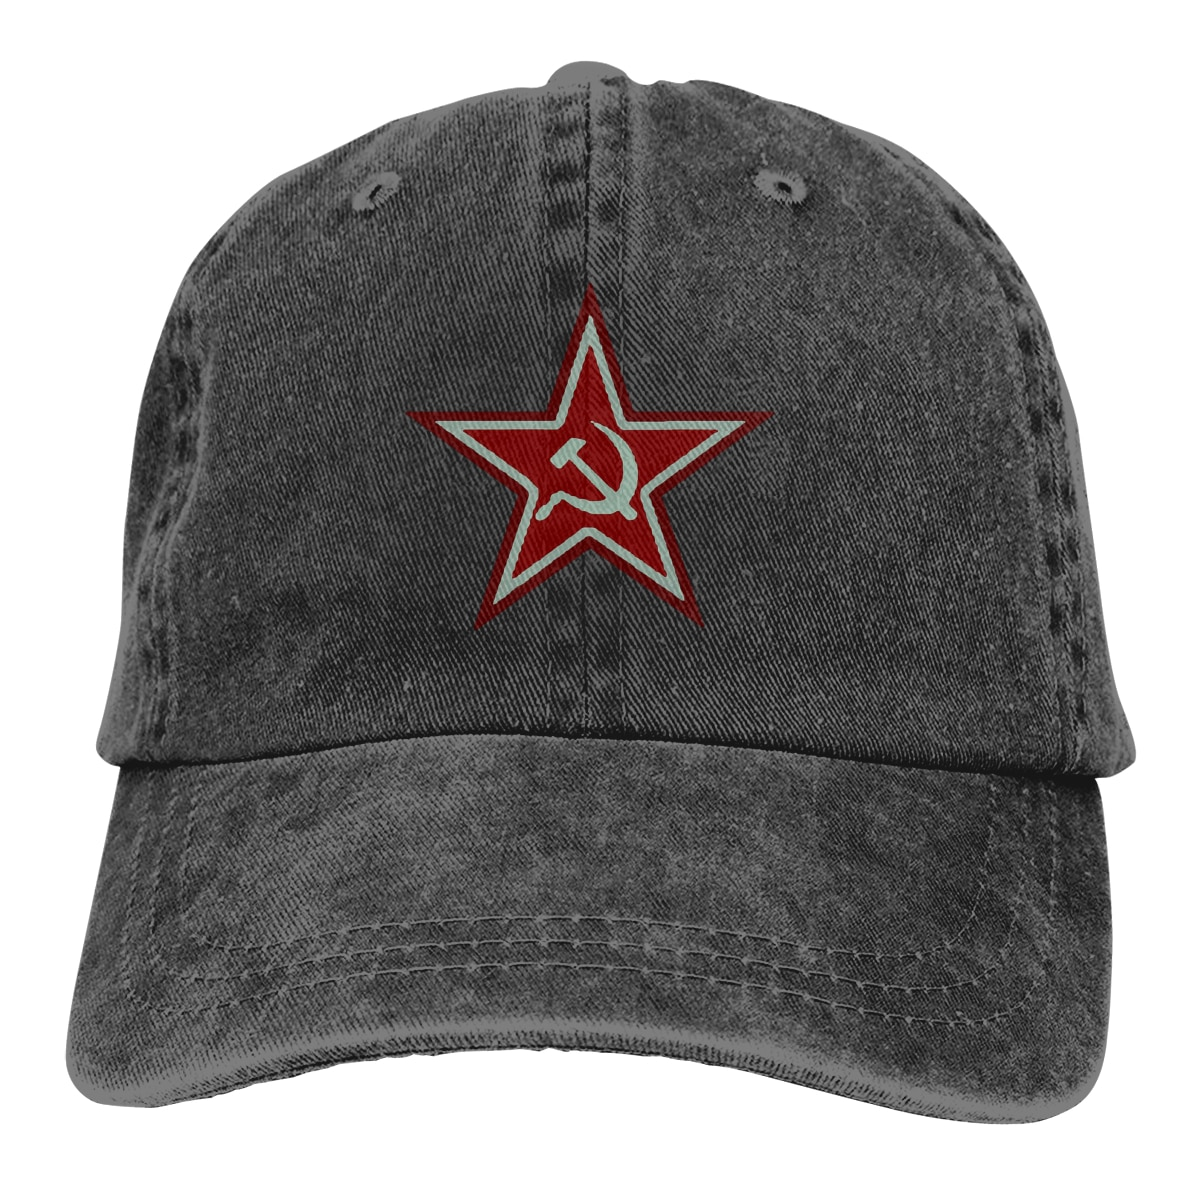 Sombreros de Color puro para papá MW3 Spedsnaz, sombrero de mujer, visera de sol, gorras de béisbol, gorra de campo de batalla